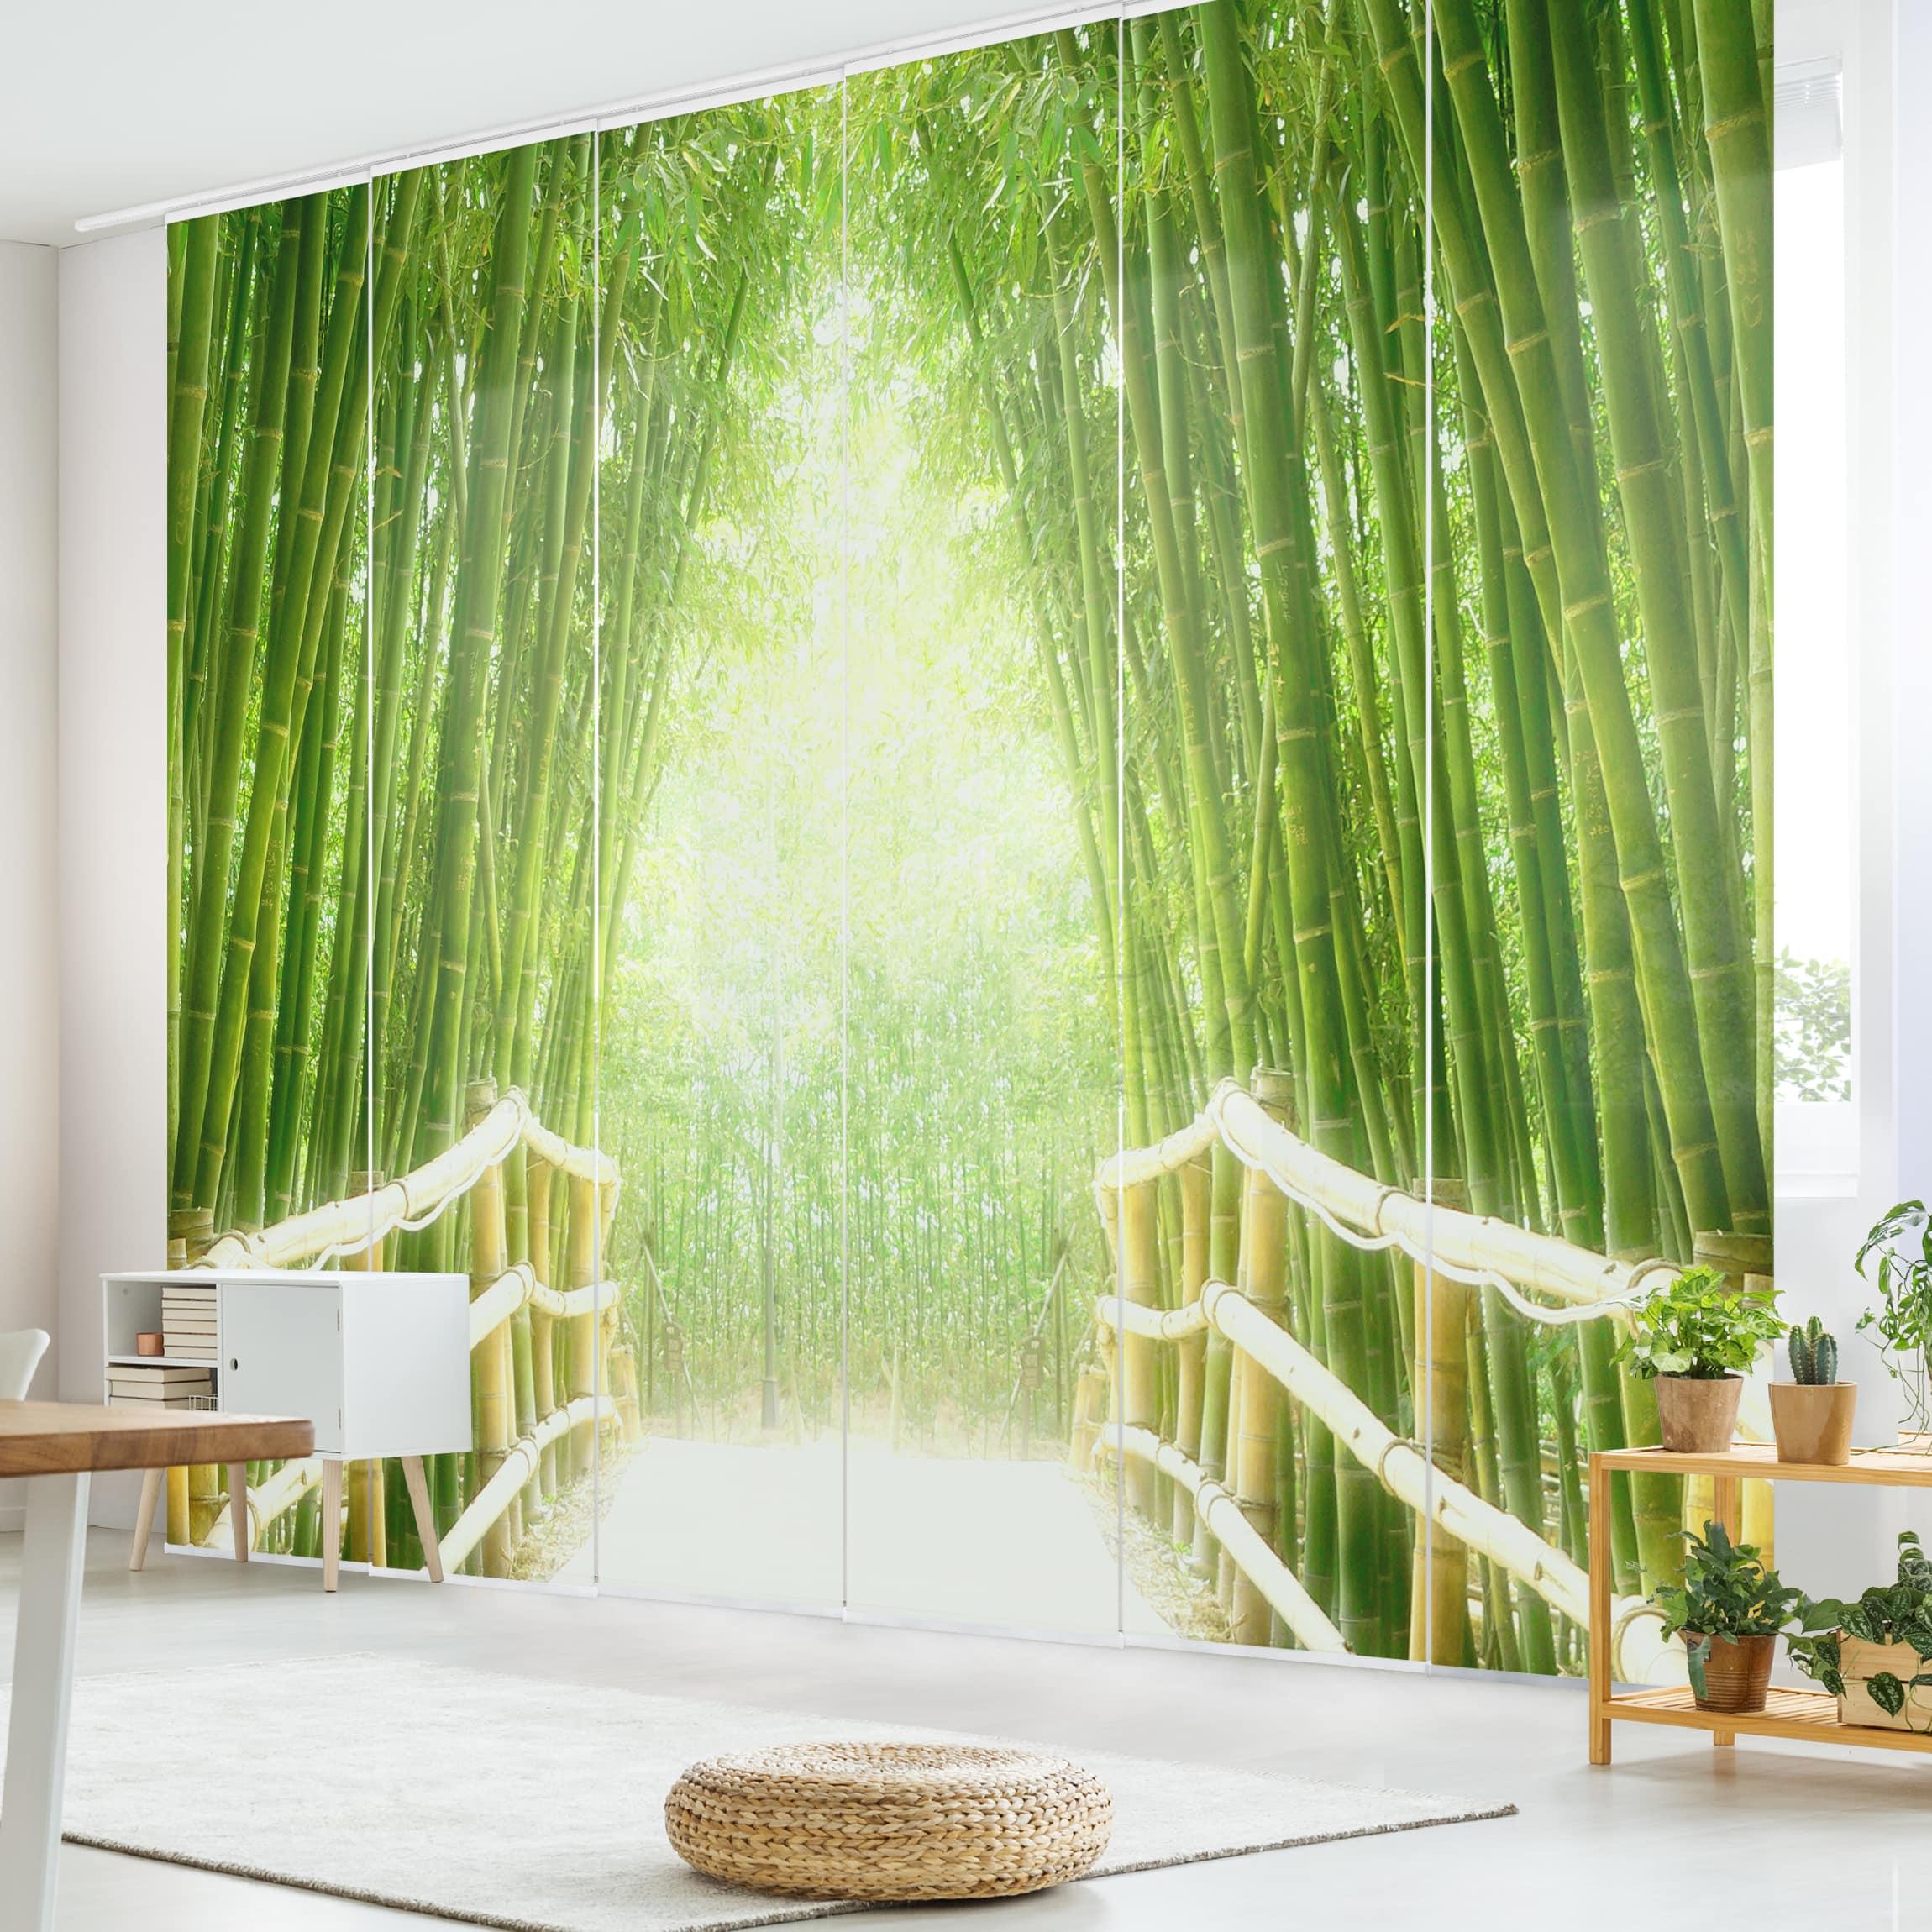 schiebegardinen set bamboo way 6 fl chenvorh nge. Black Bedroom Furniture Sets. Home Design Ideas